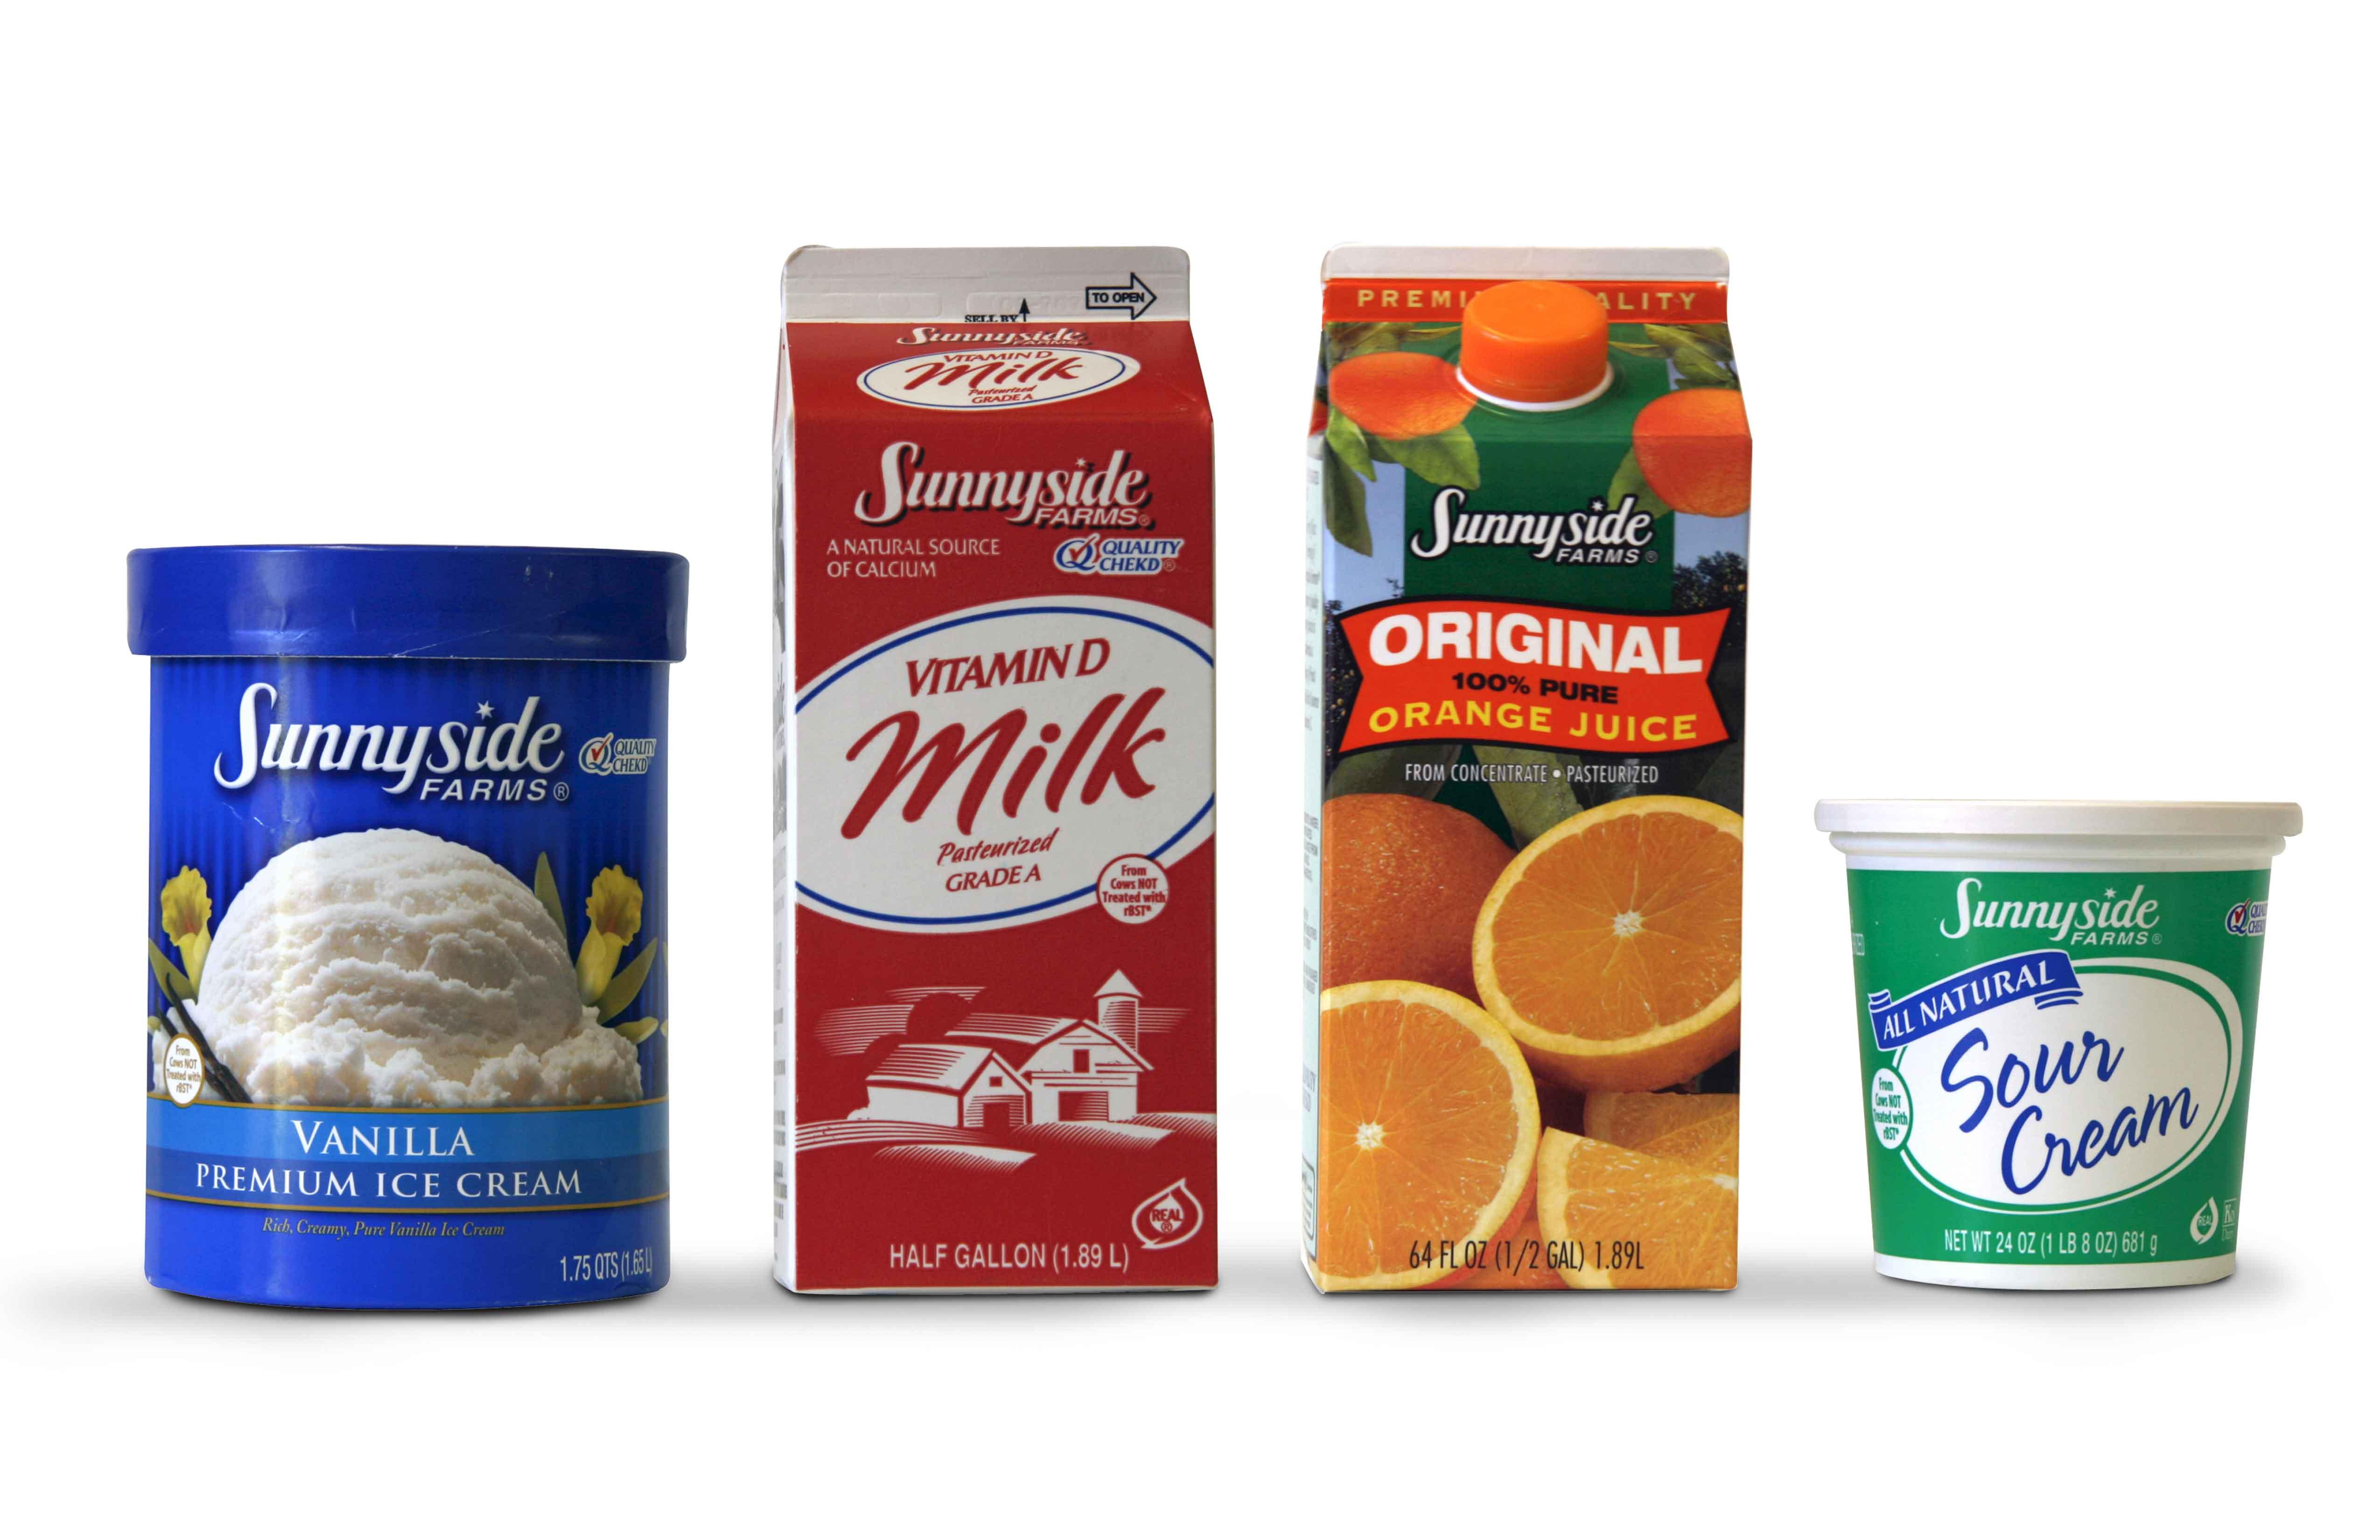 Sunnyside Farms Packaging